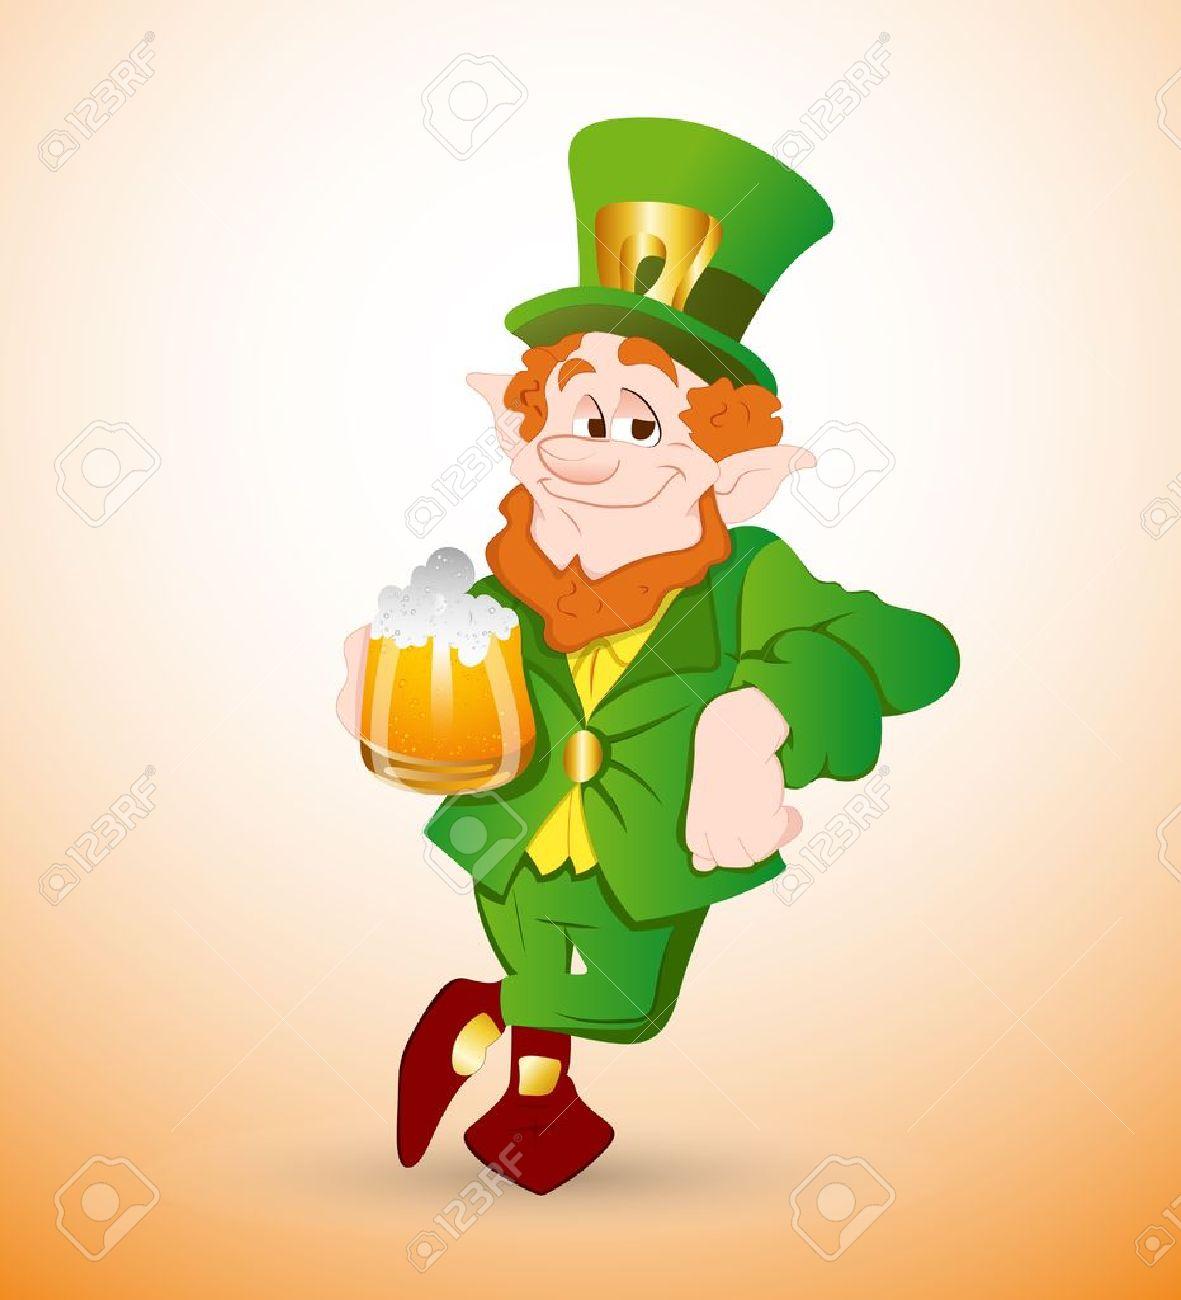 51 833 irish cliparts stock vector and royalty free irish